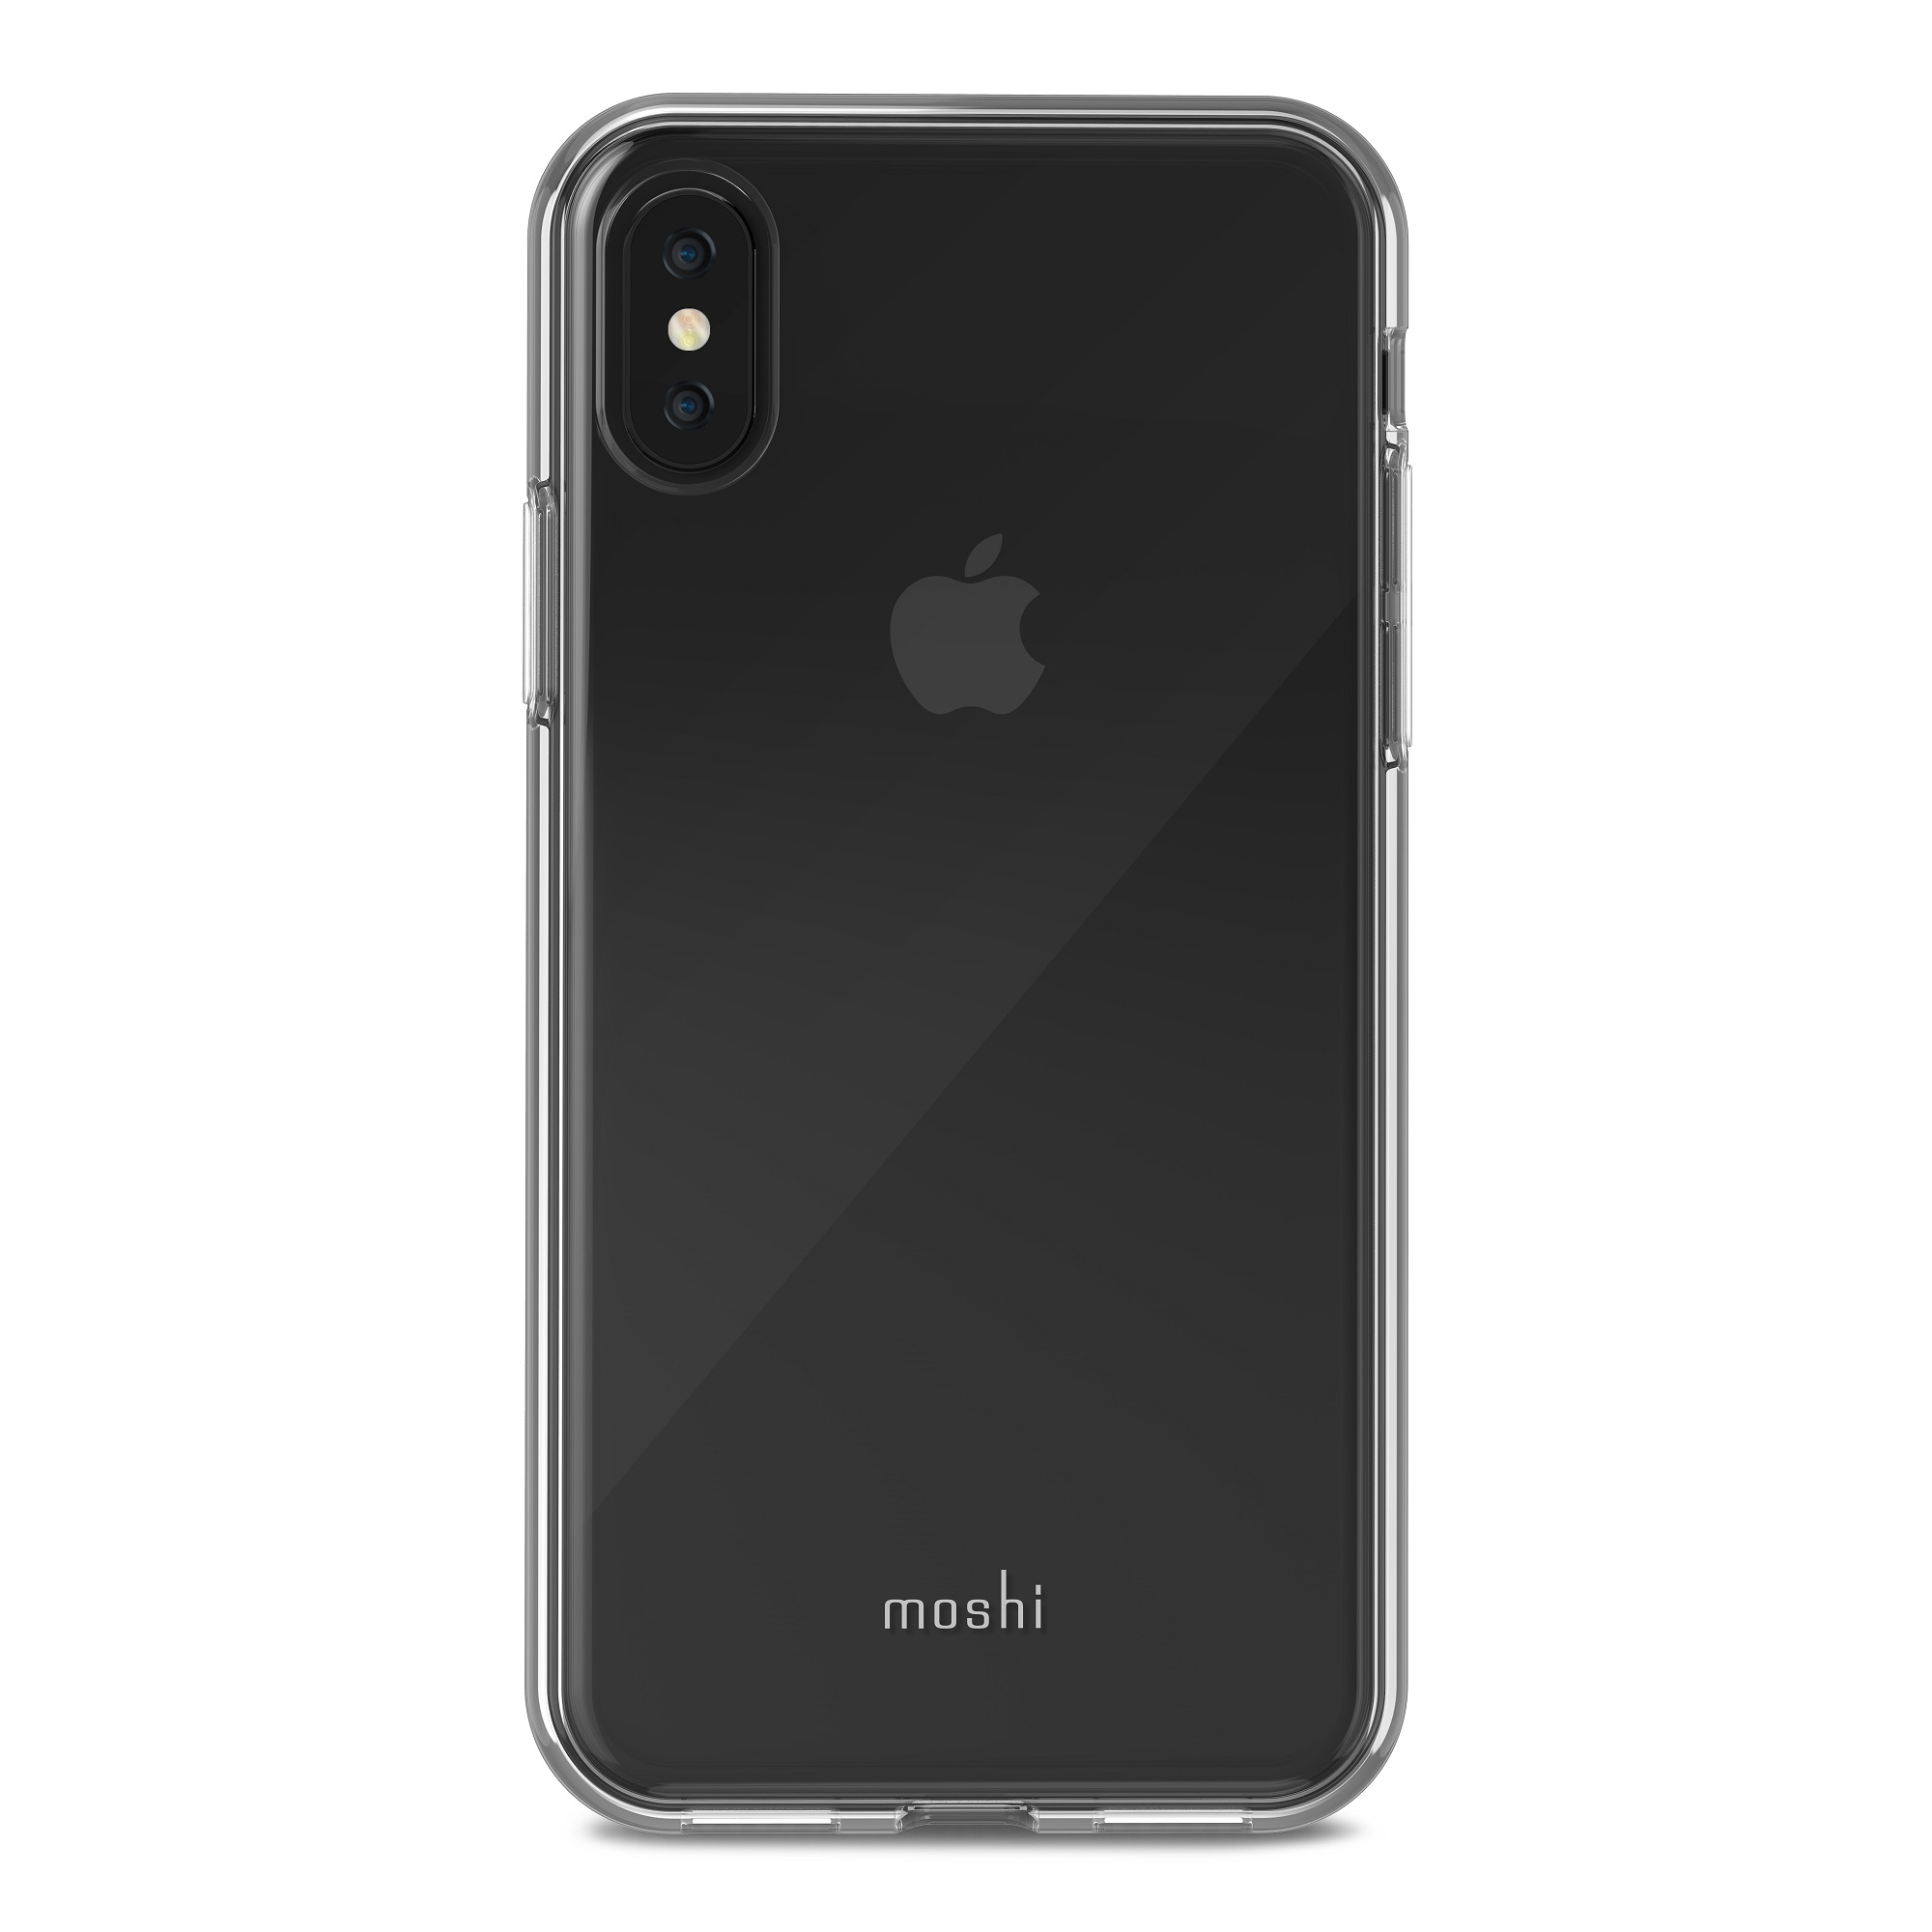 Moshi Vitros Case for iPhone XS/X